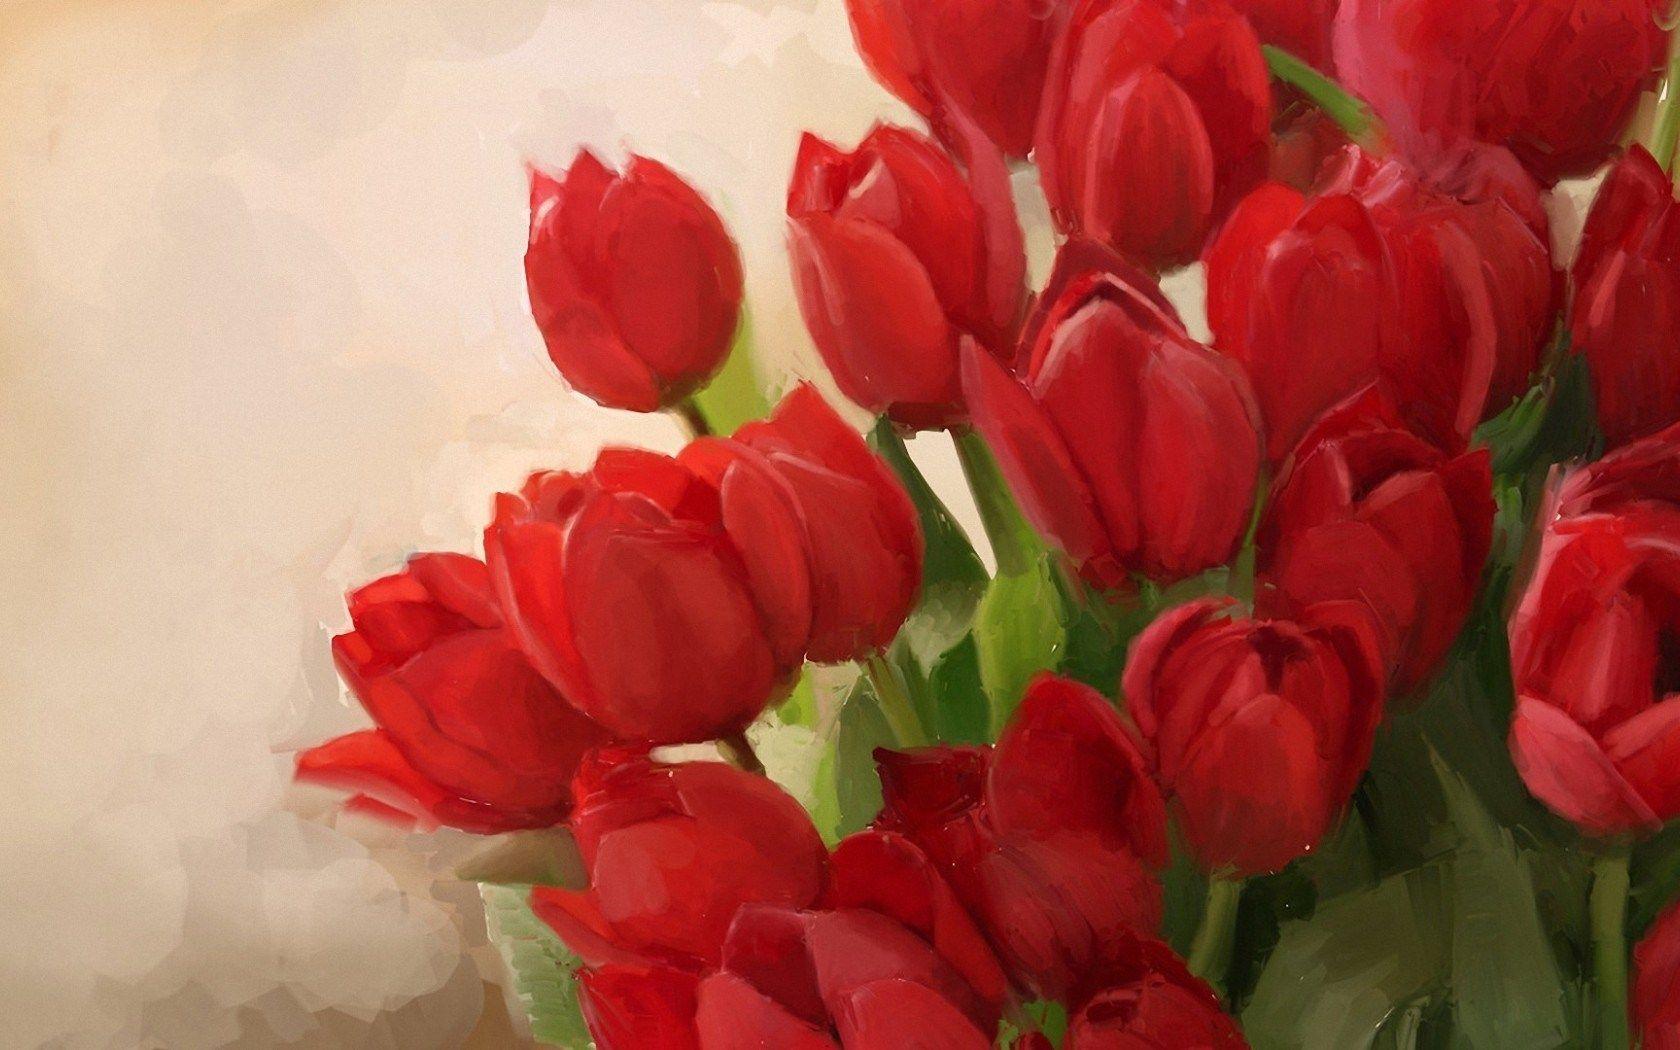 Tulips Red Flowers Art Hd Wallpaper Zoomwalls